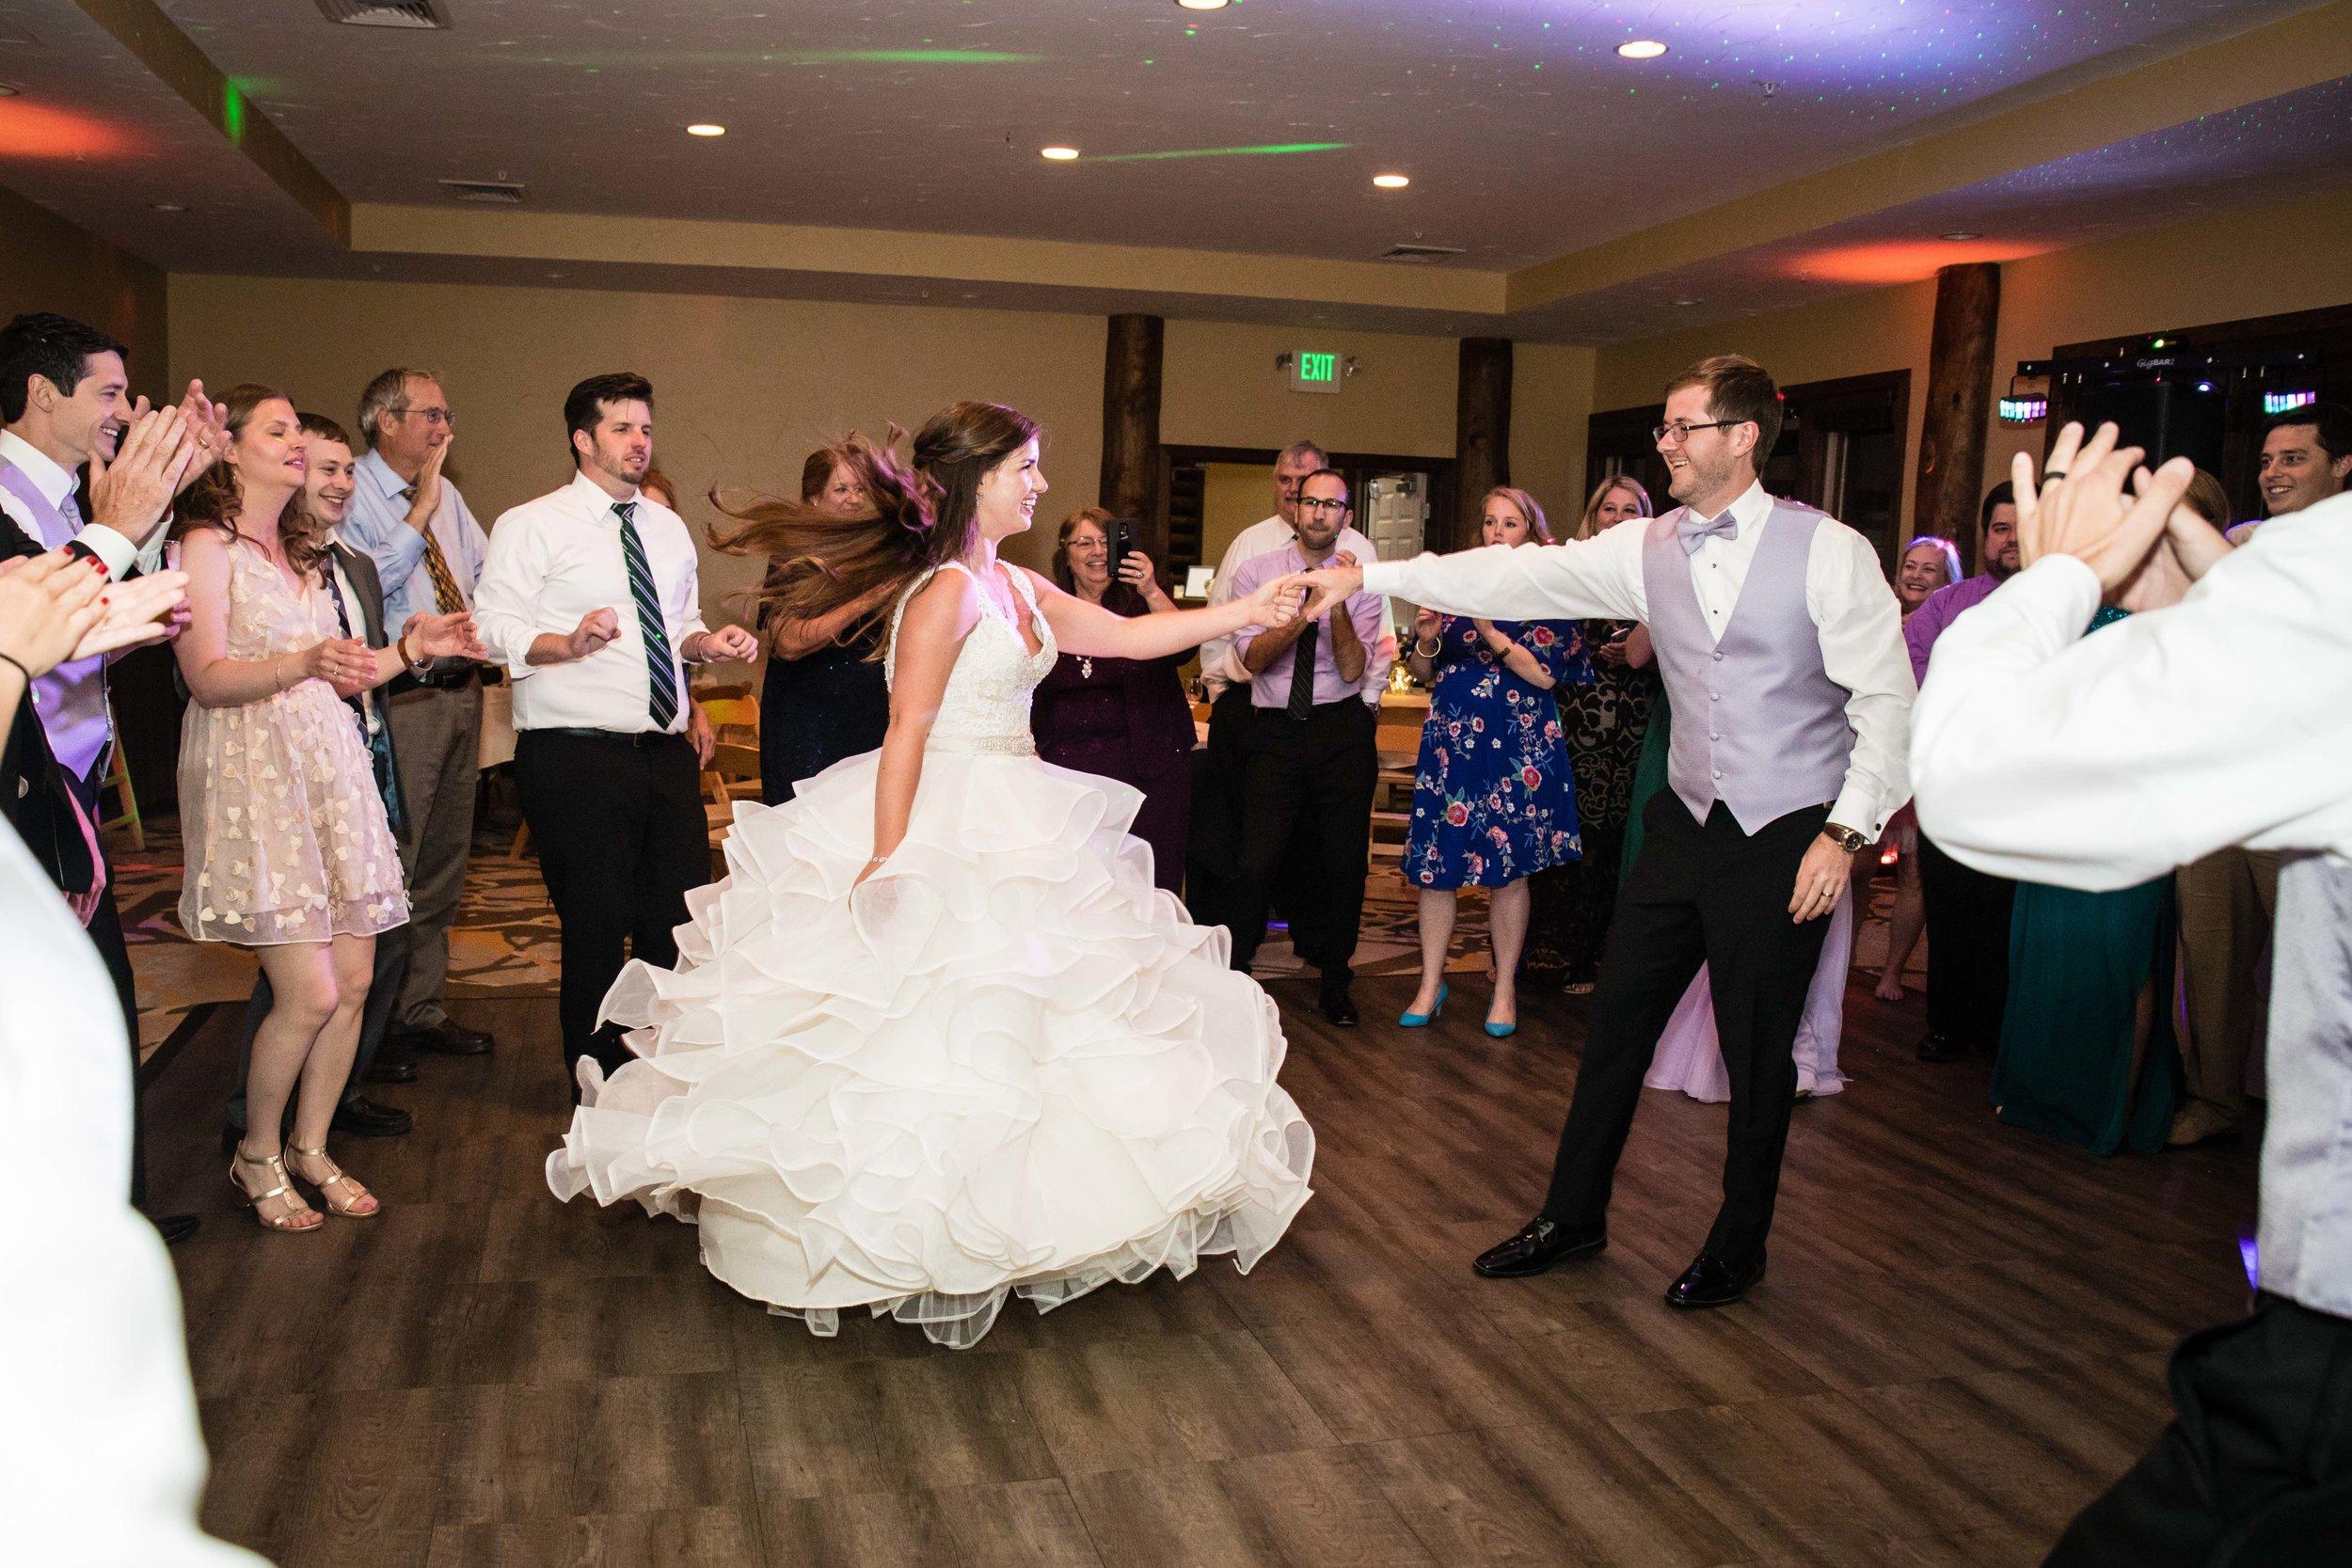 The Lodge at Breckenridge Wedding Reception